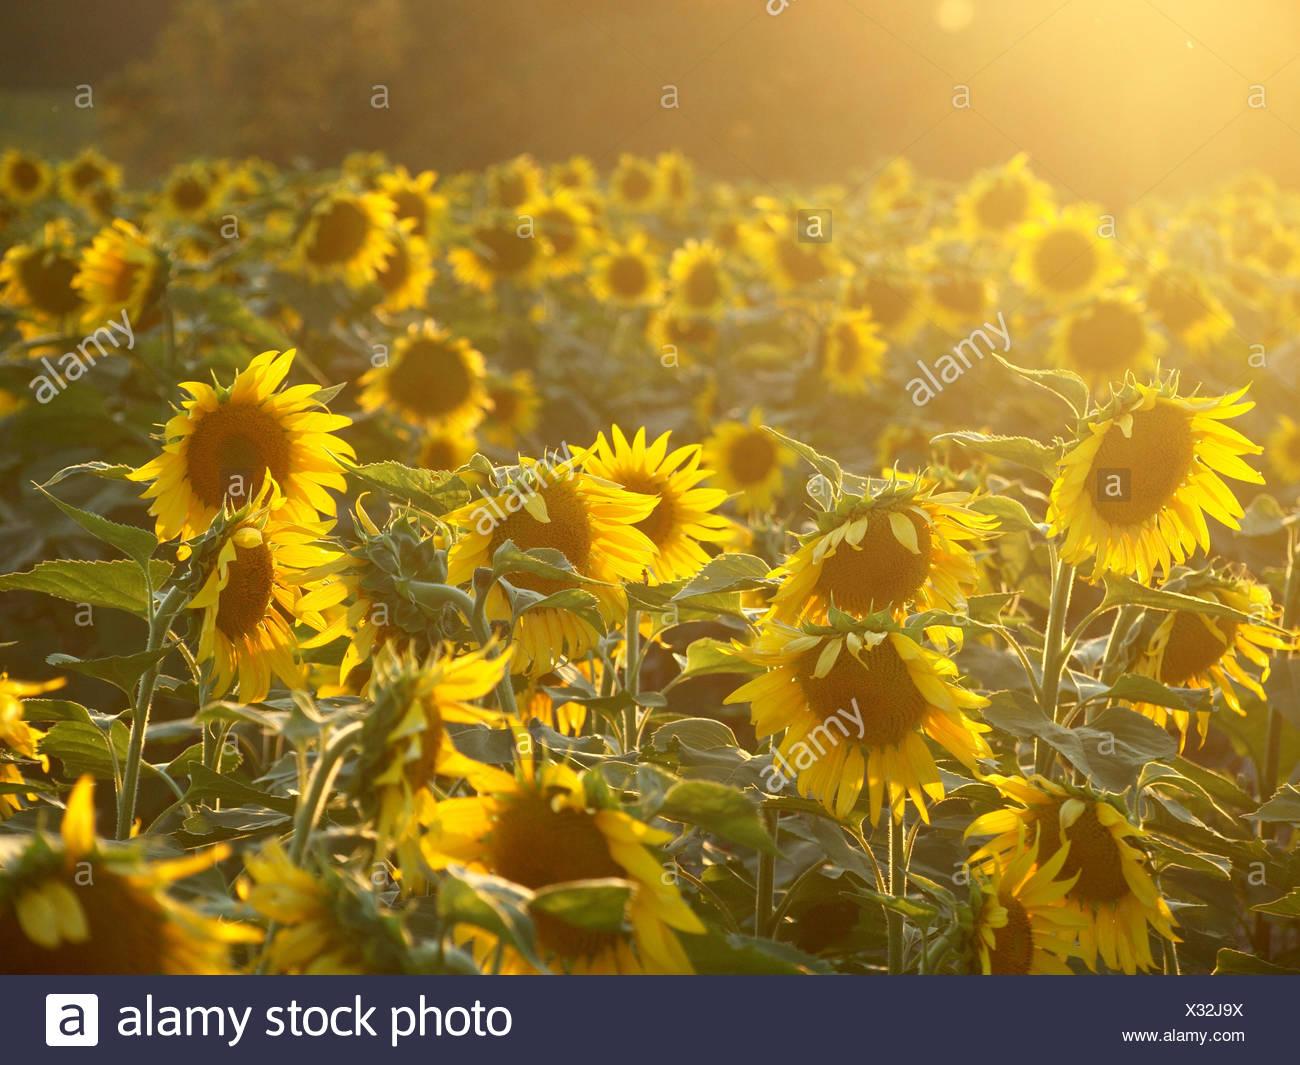 Field of sunflowers, North Carolina, America, USA - Stock Image